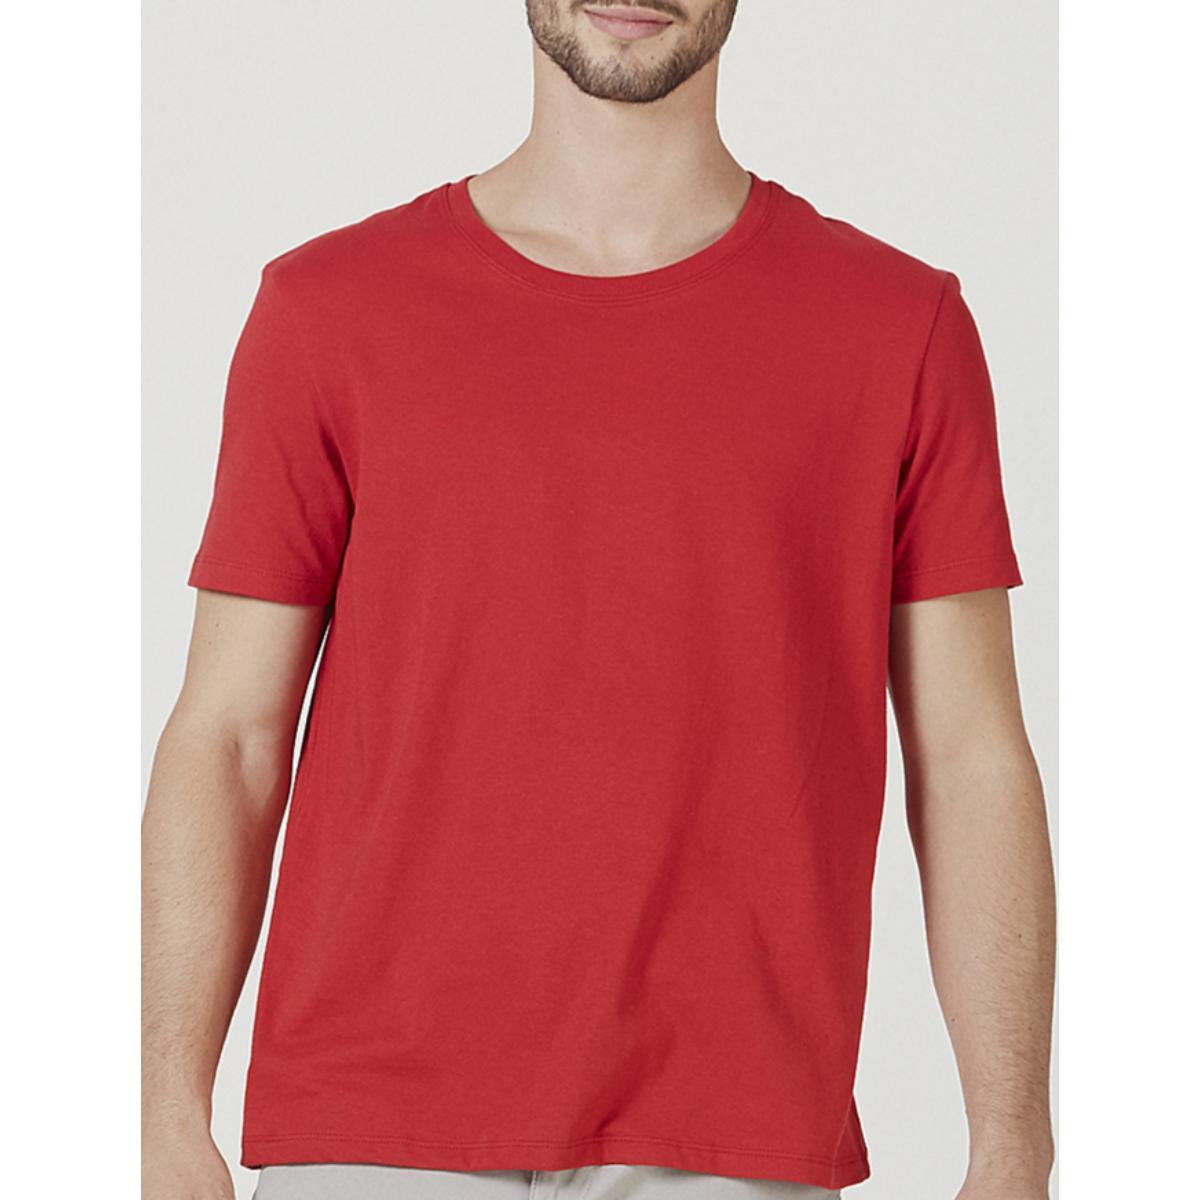 Camiseta Masculina Hering 0201 Rvten Vermelho